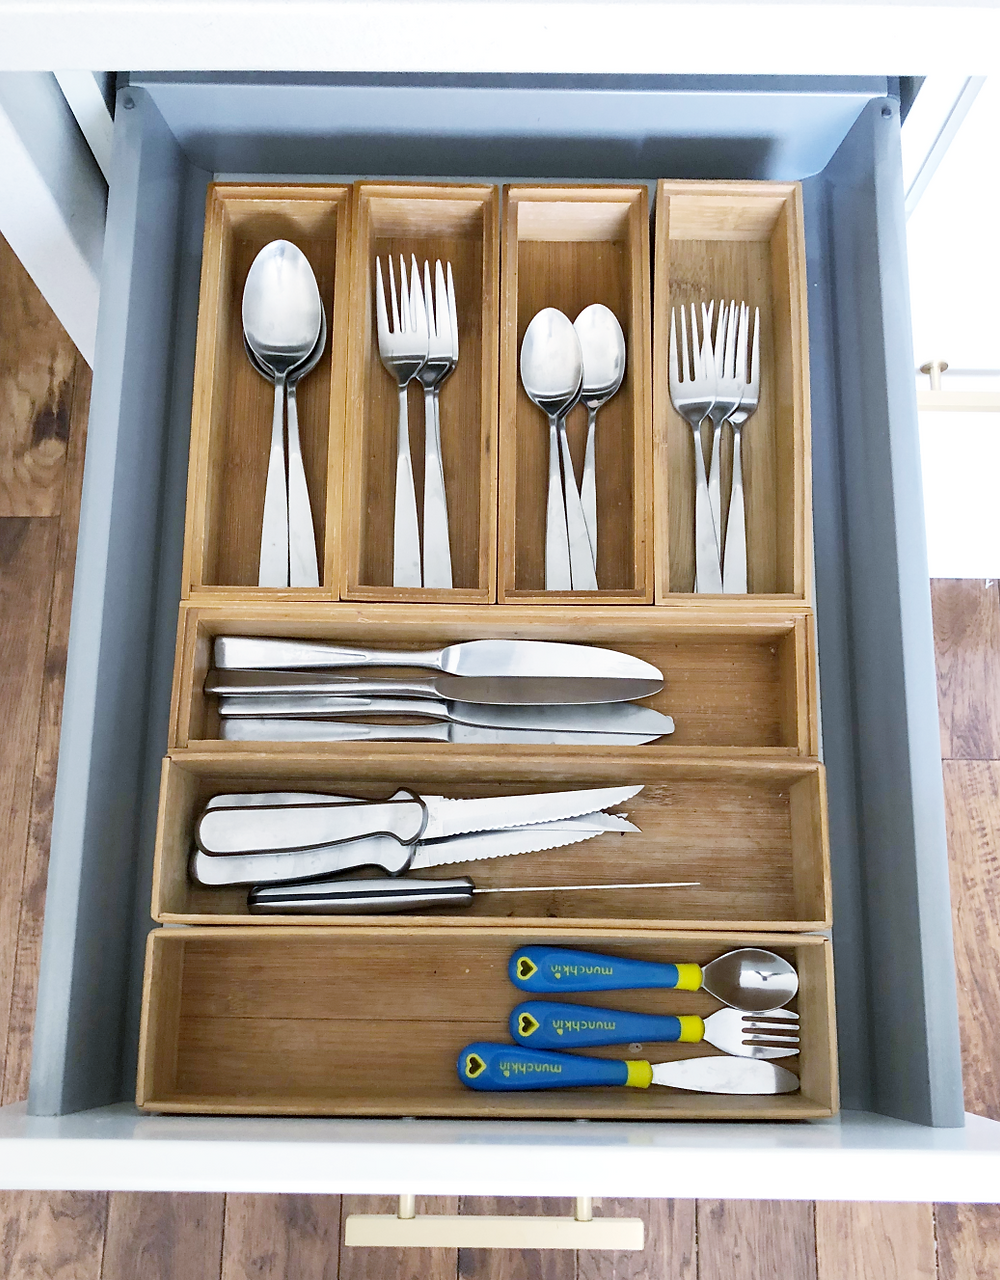 Cutlery drawer organizer bamboo